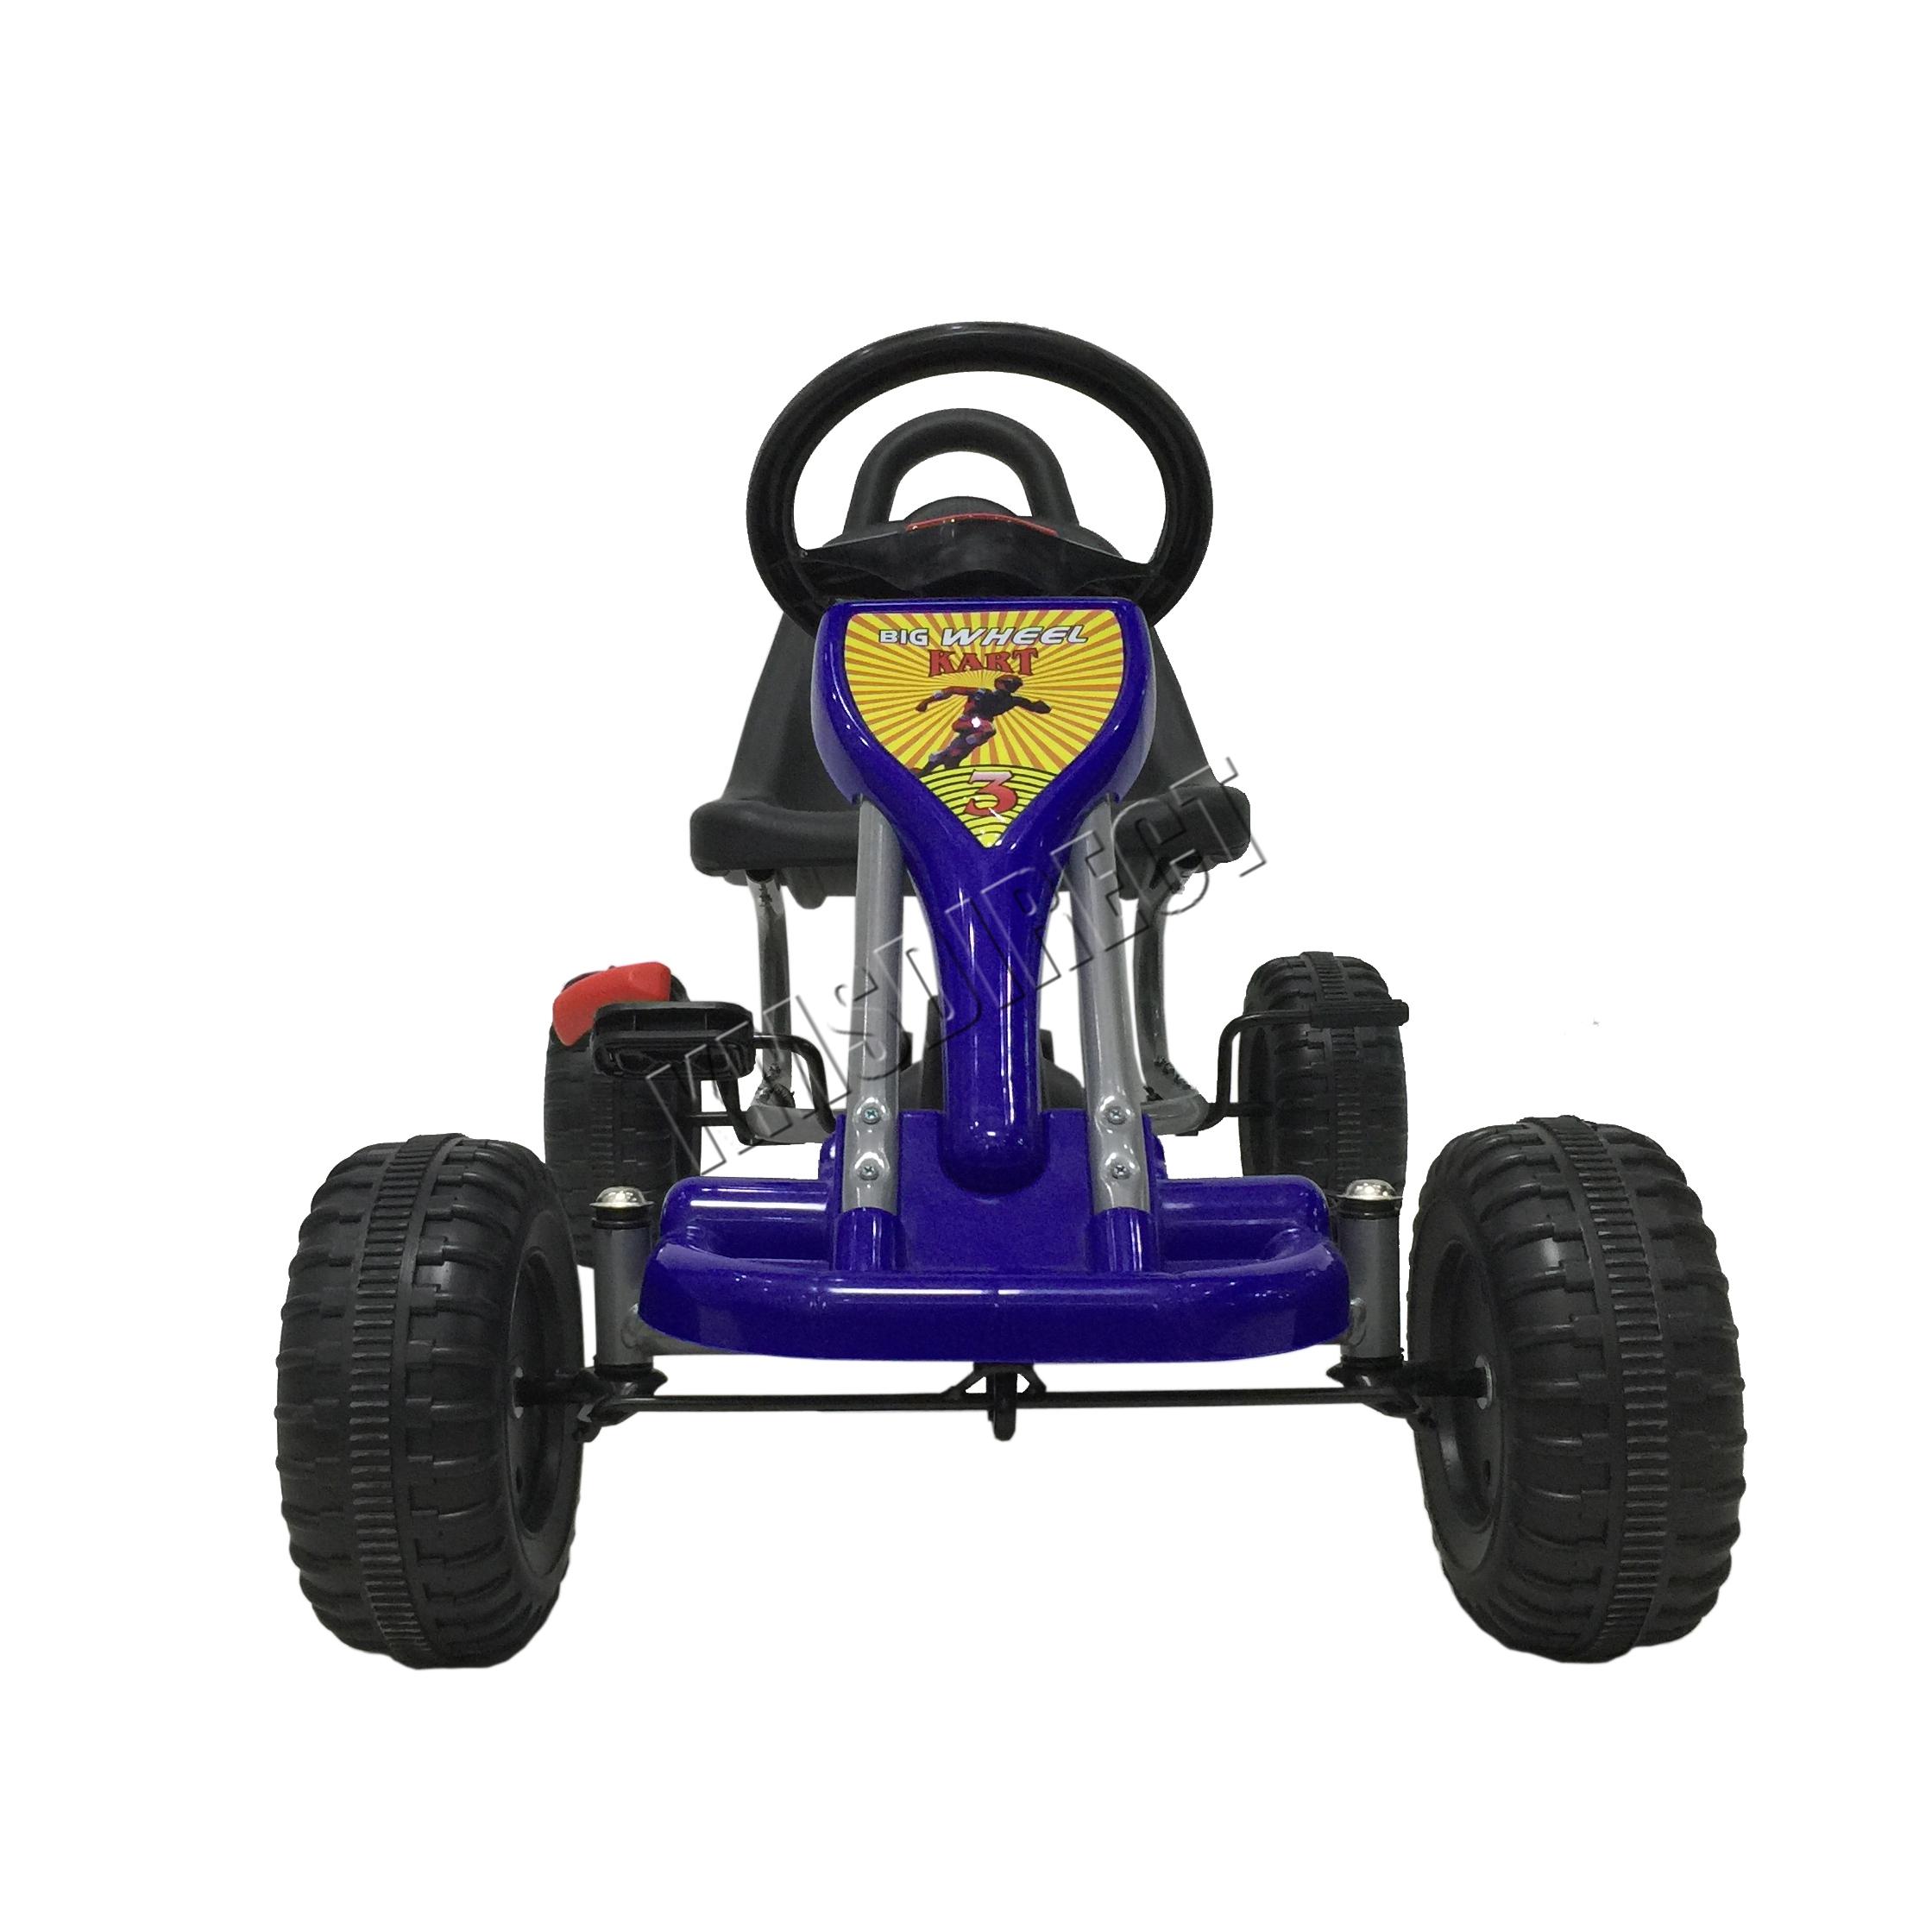 foxhunter kinder go kart rutscher auto pedale mit plastik. Black Bedroom Furniture Sets. Home Design Ideas